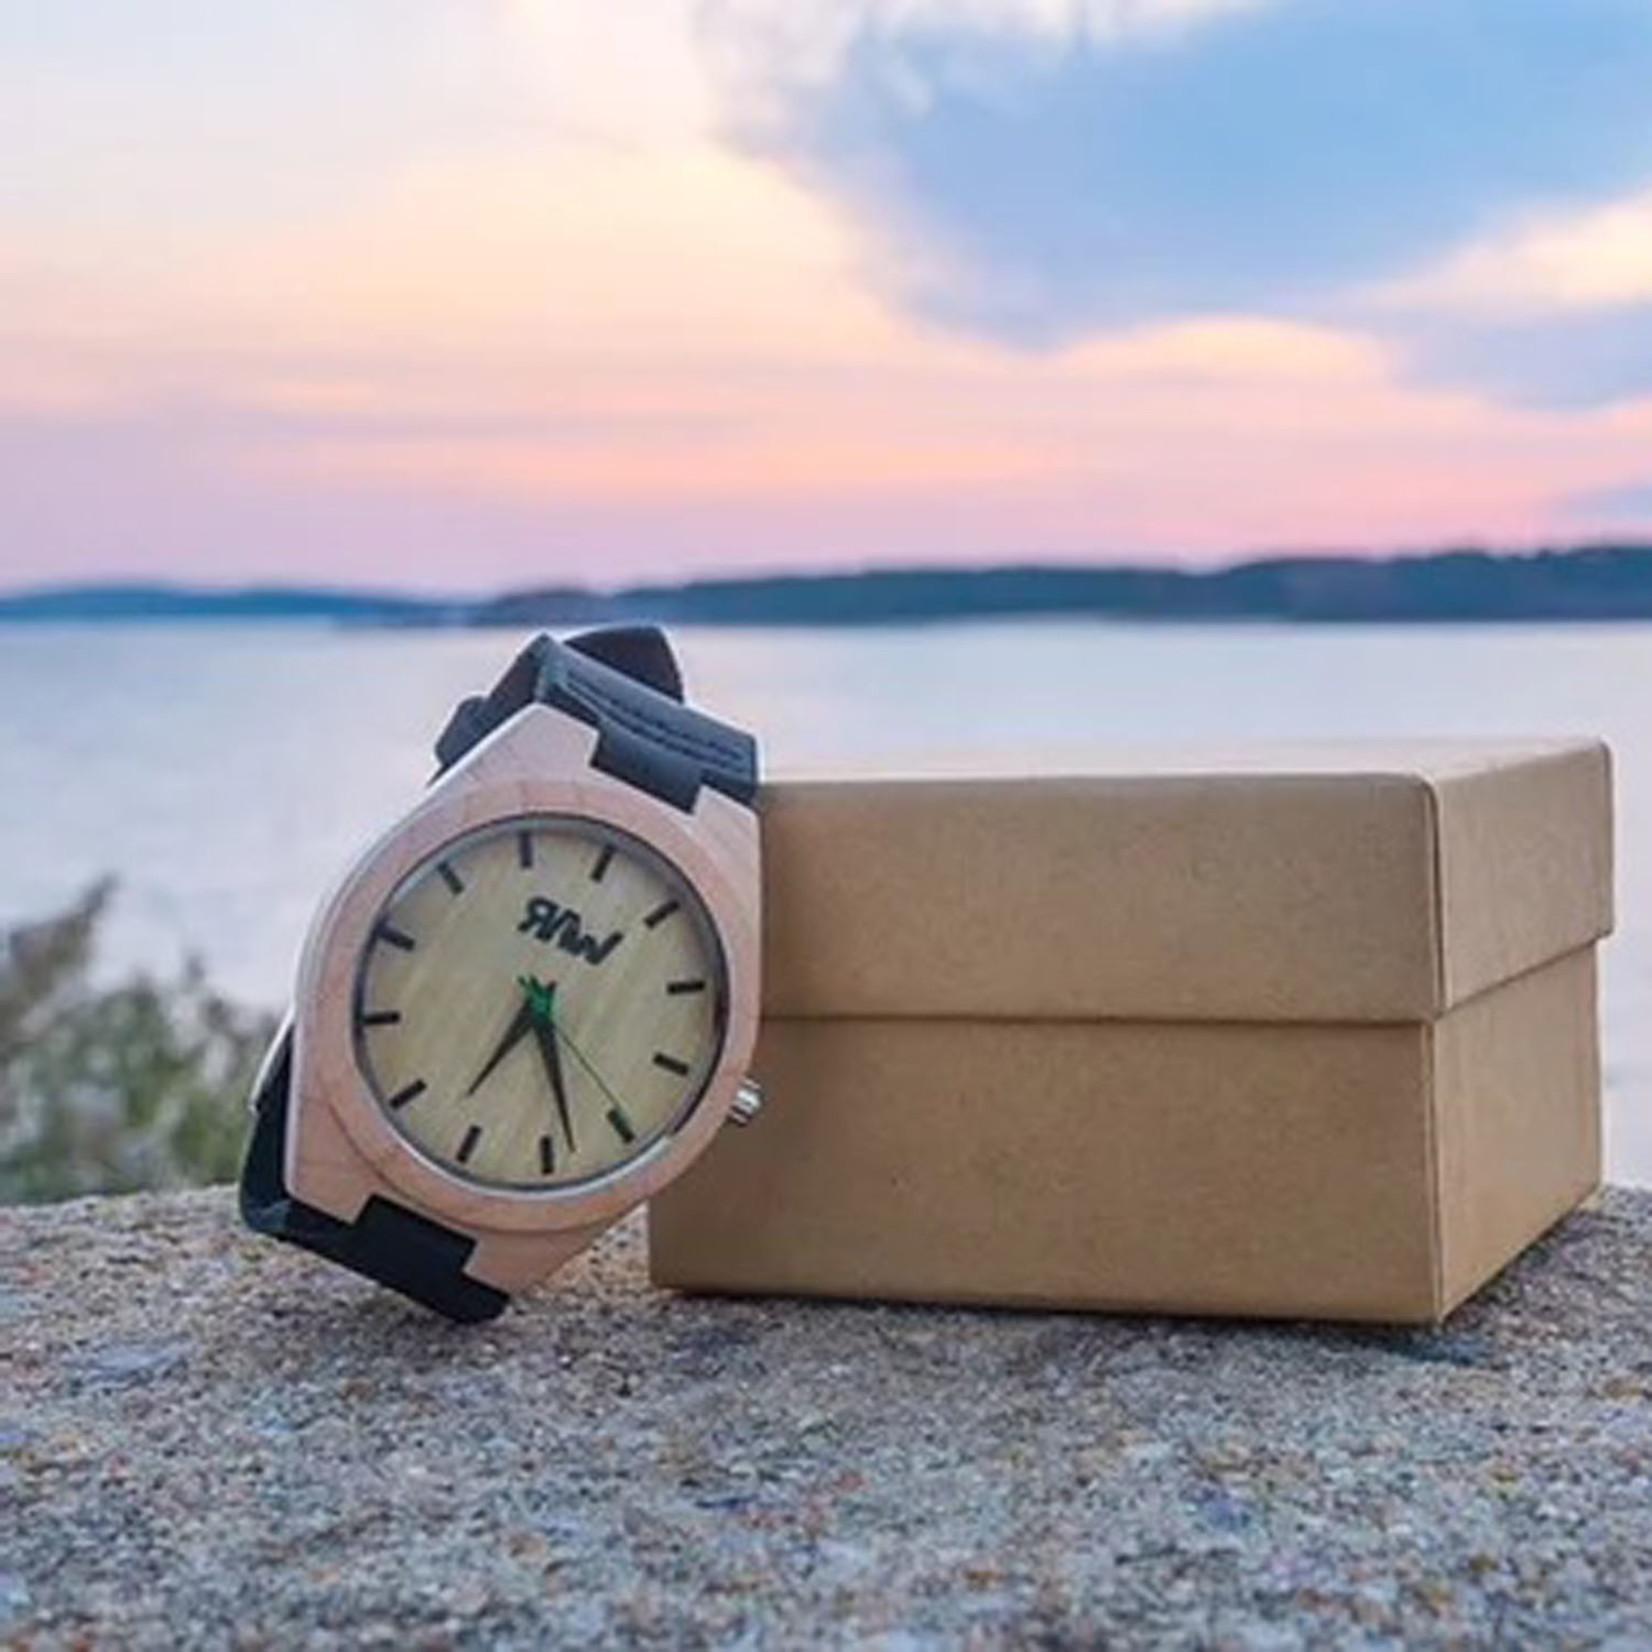 Raw Watches Pine Watch